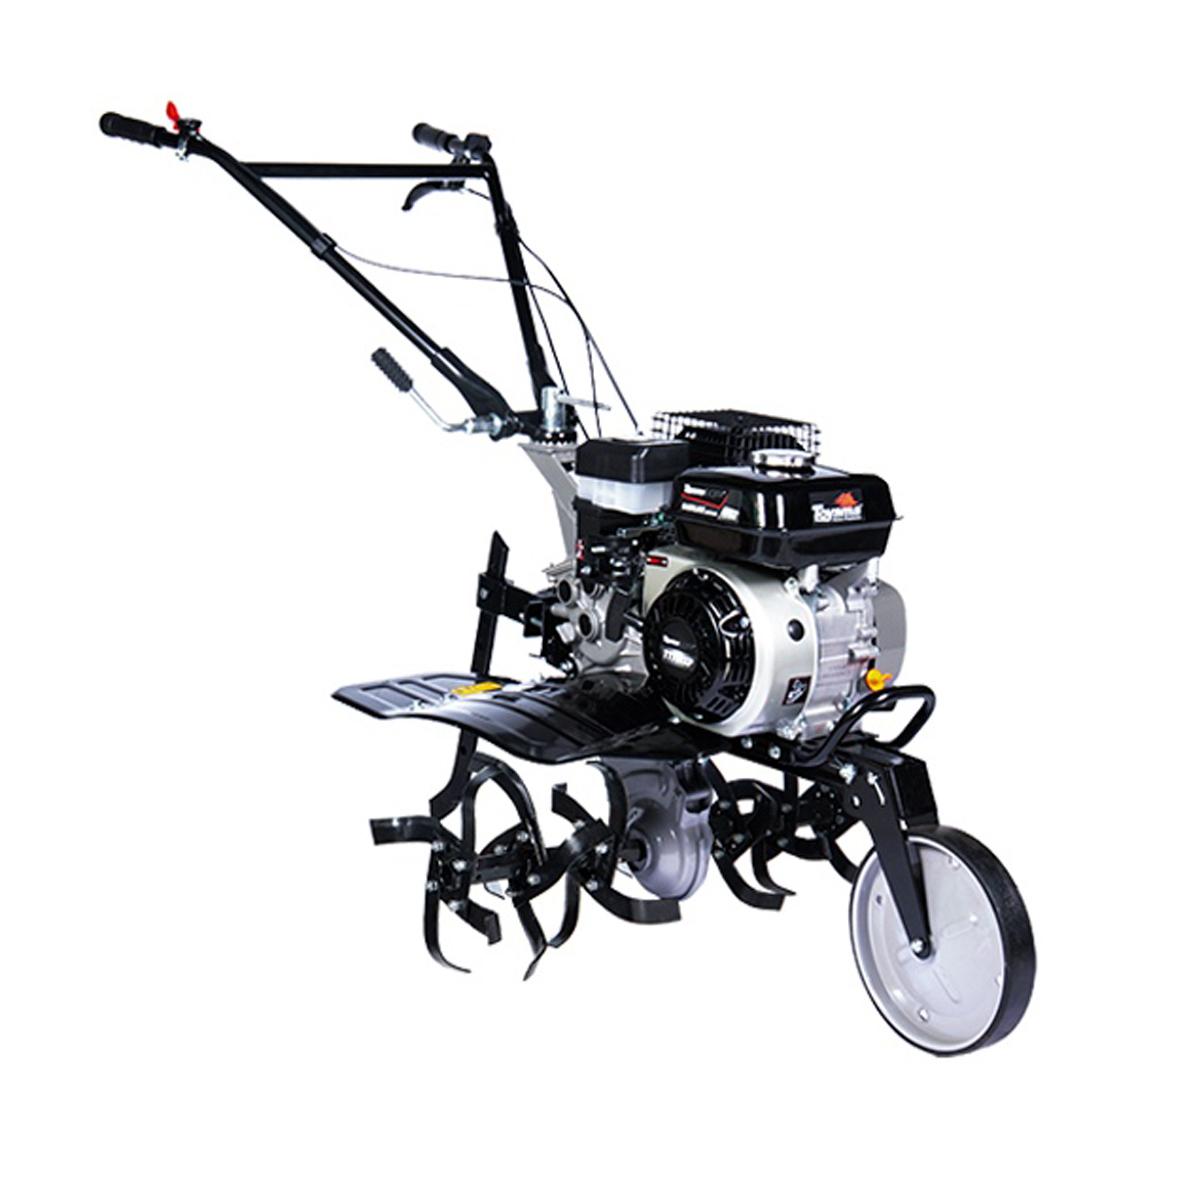 Motocultivador Gasolina TT75R-XP Partida Manual 7 Hp Toyama